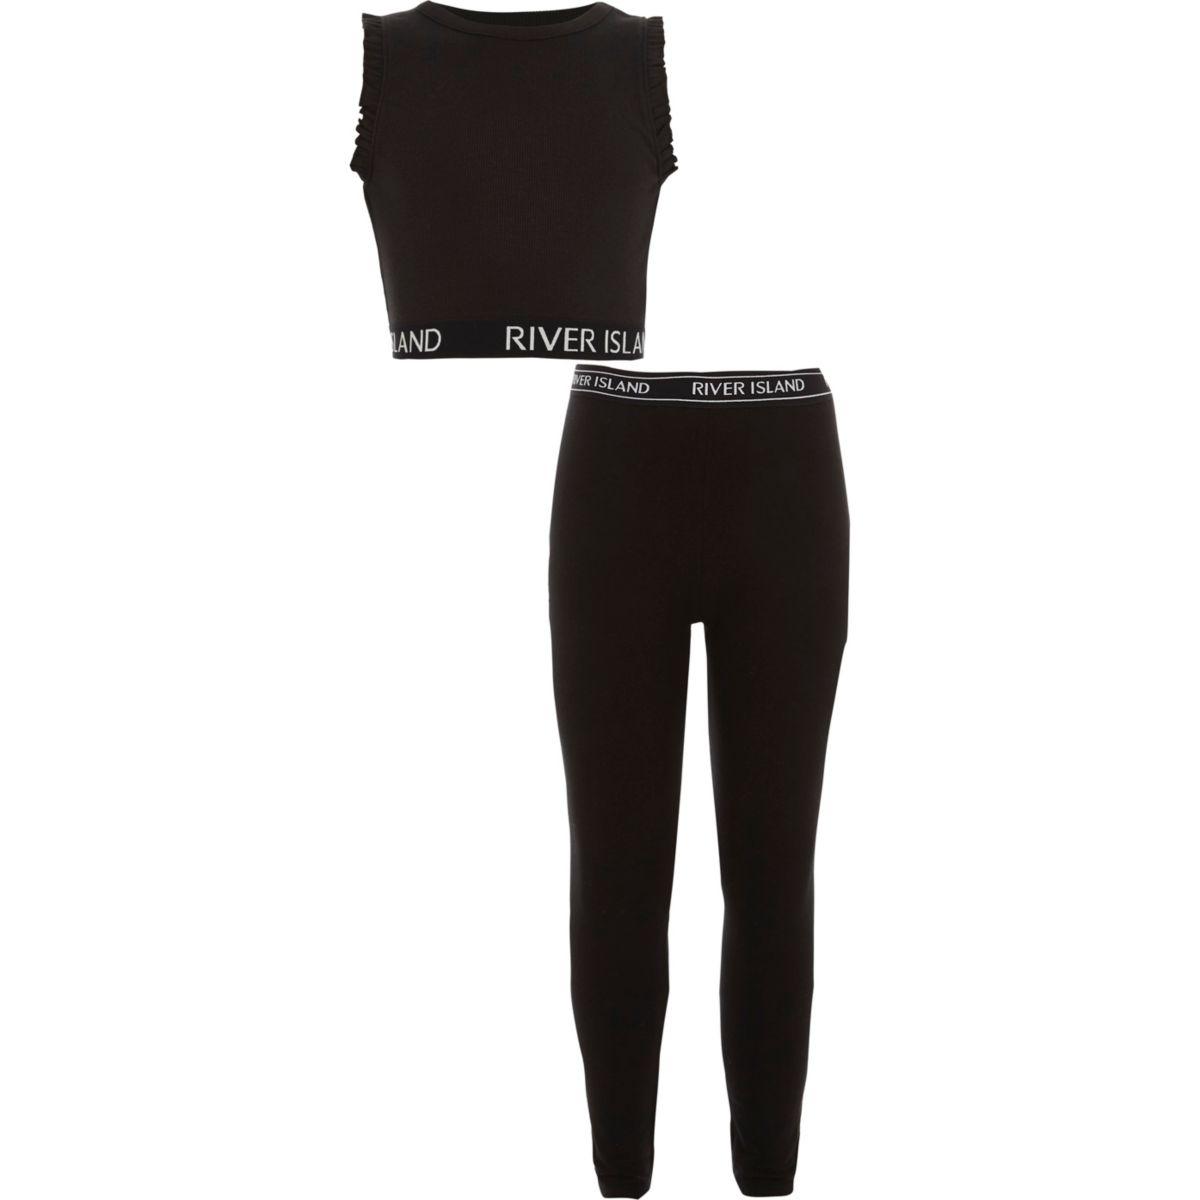 Girls RI black crop top and leggings outfit